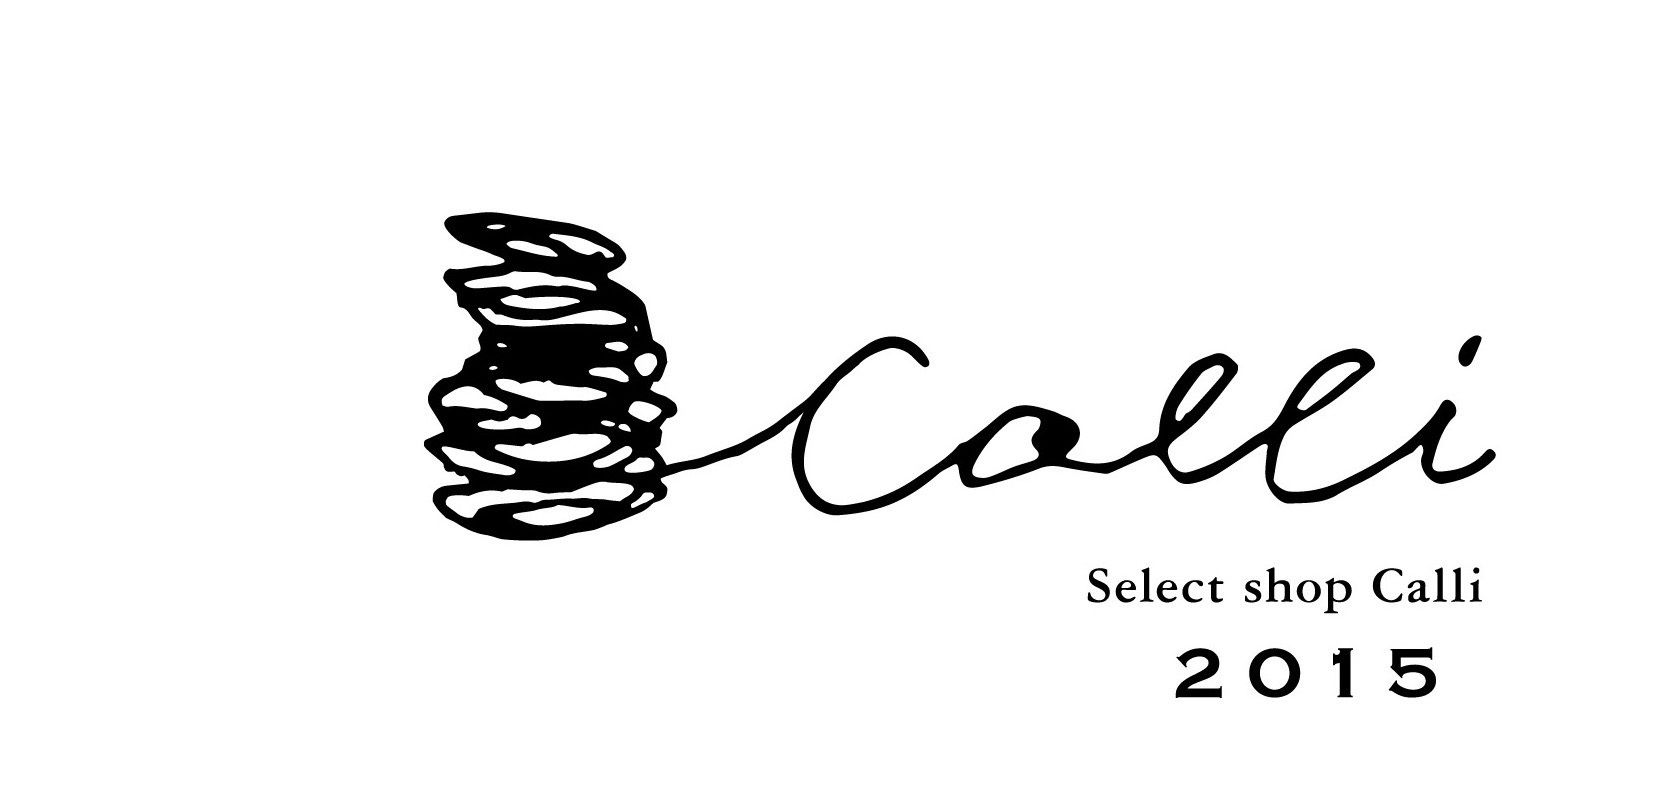 select shop Calli